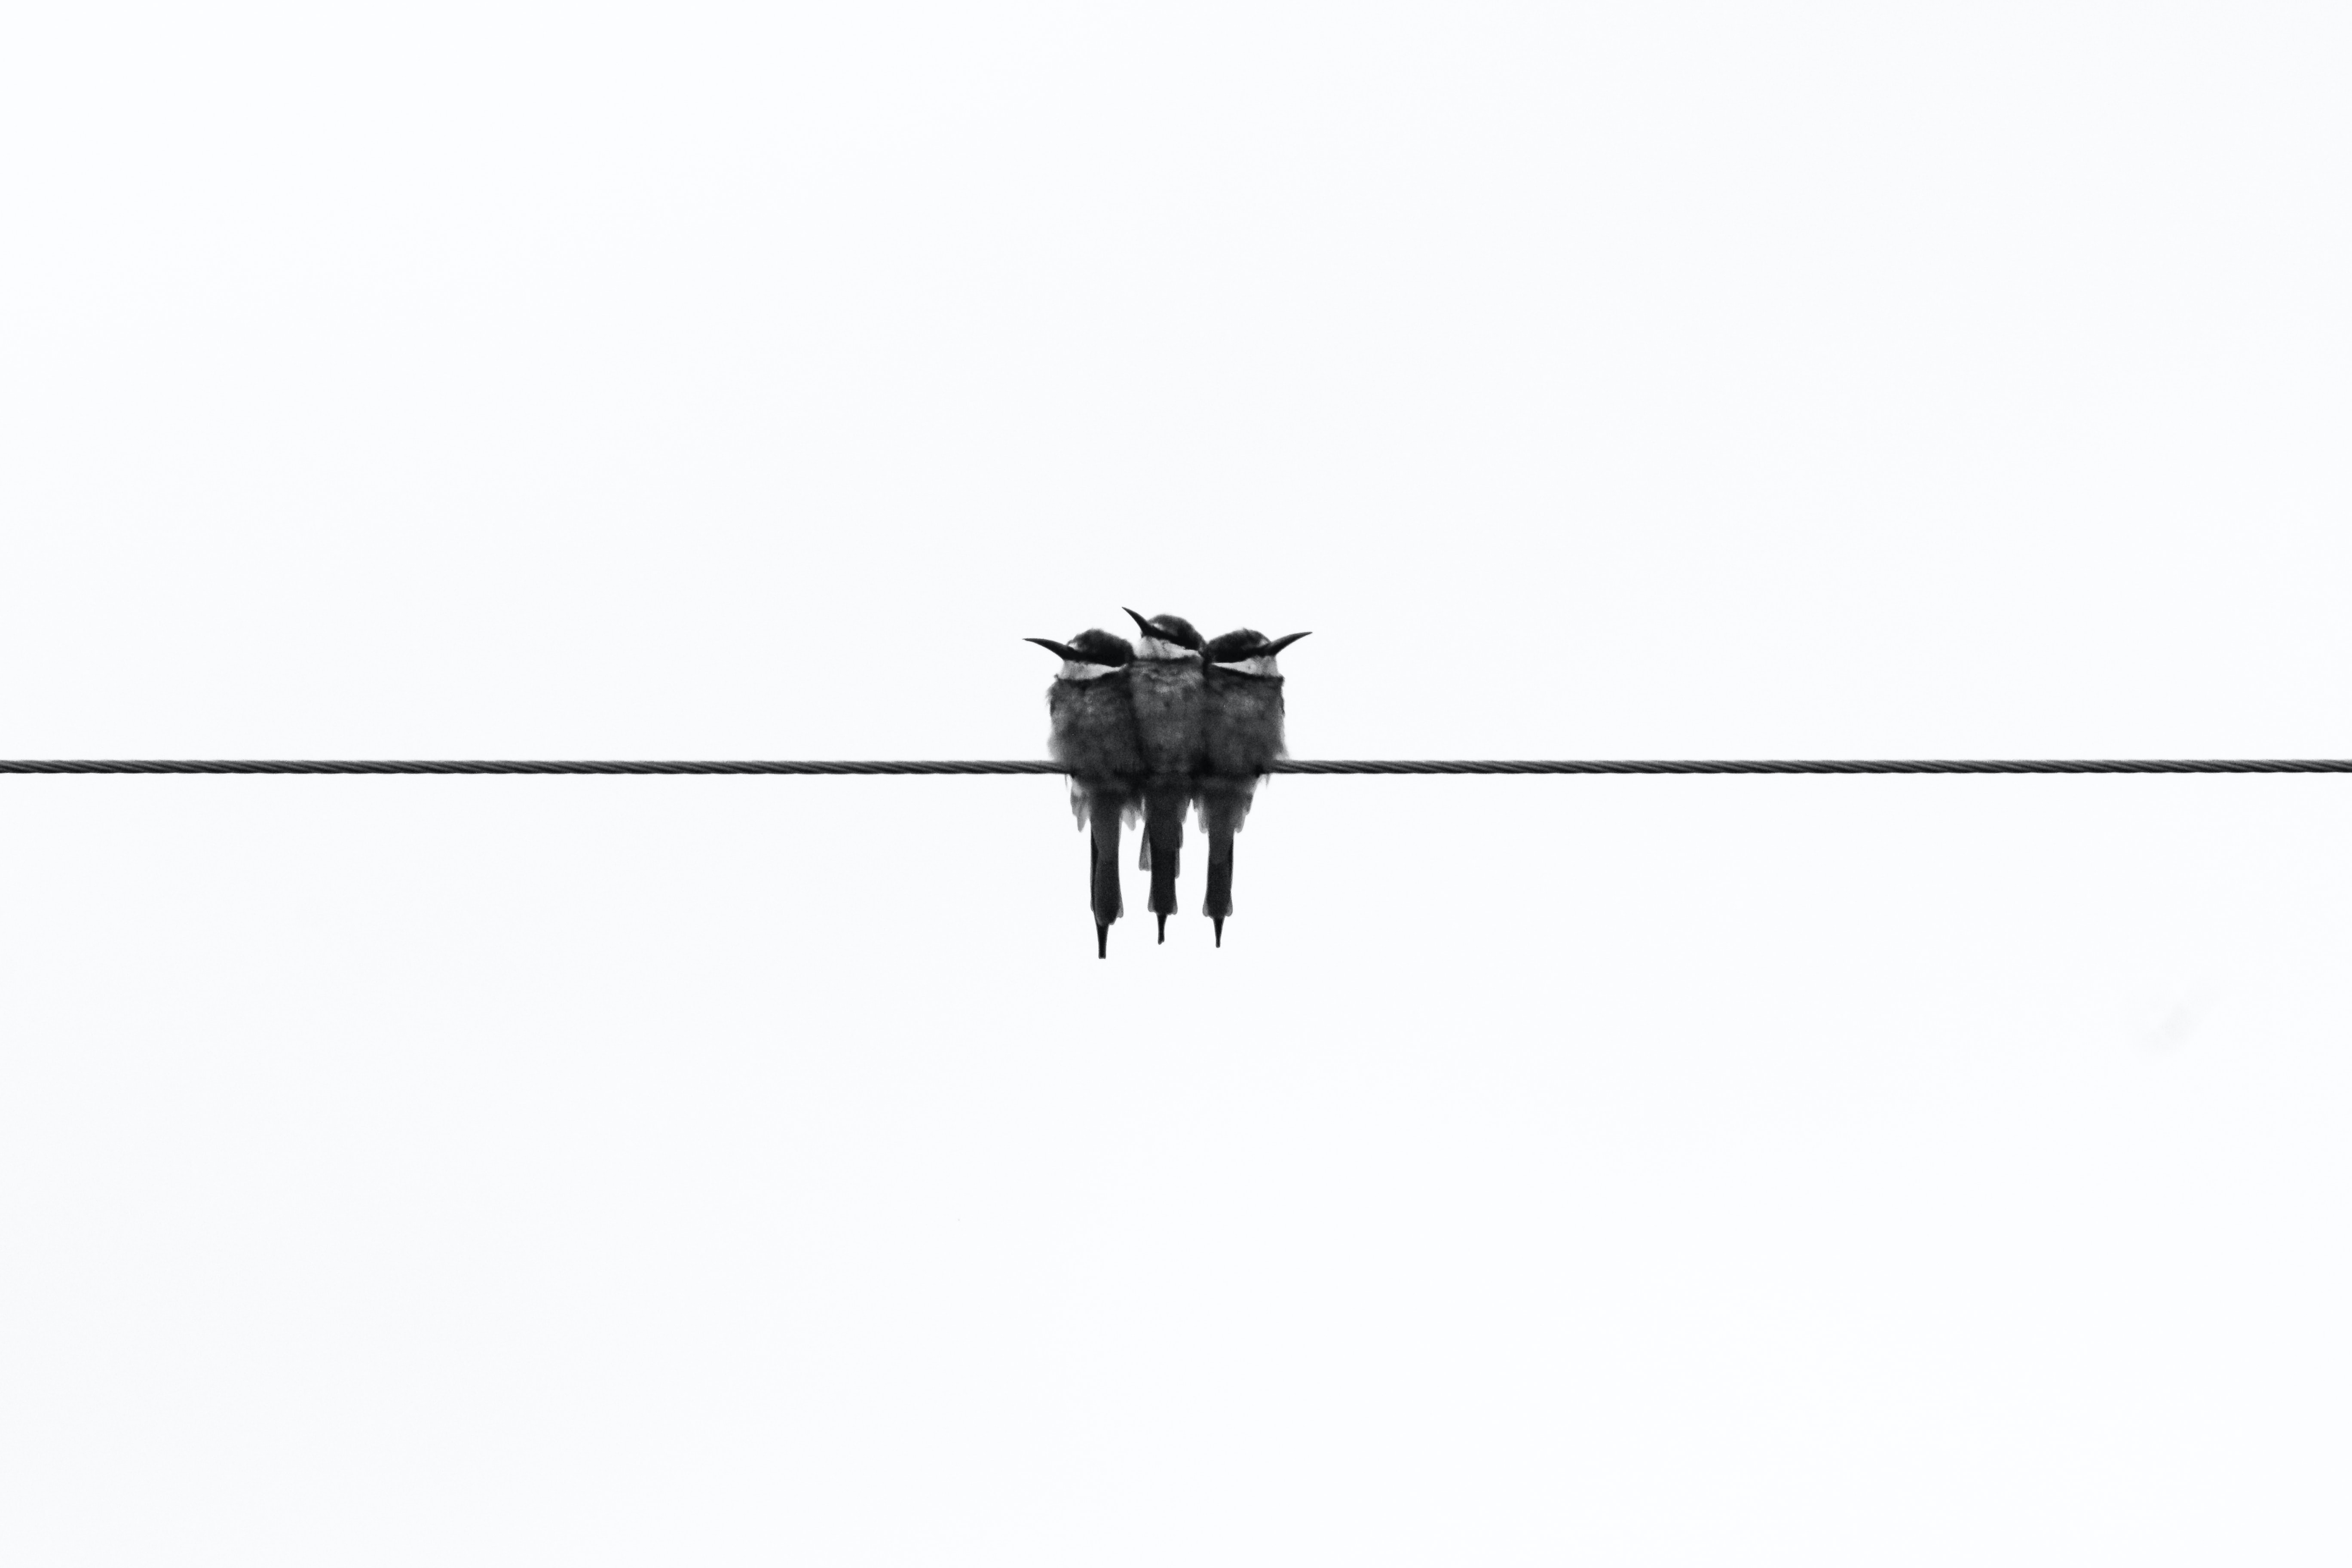 three gray kingfisher birds